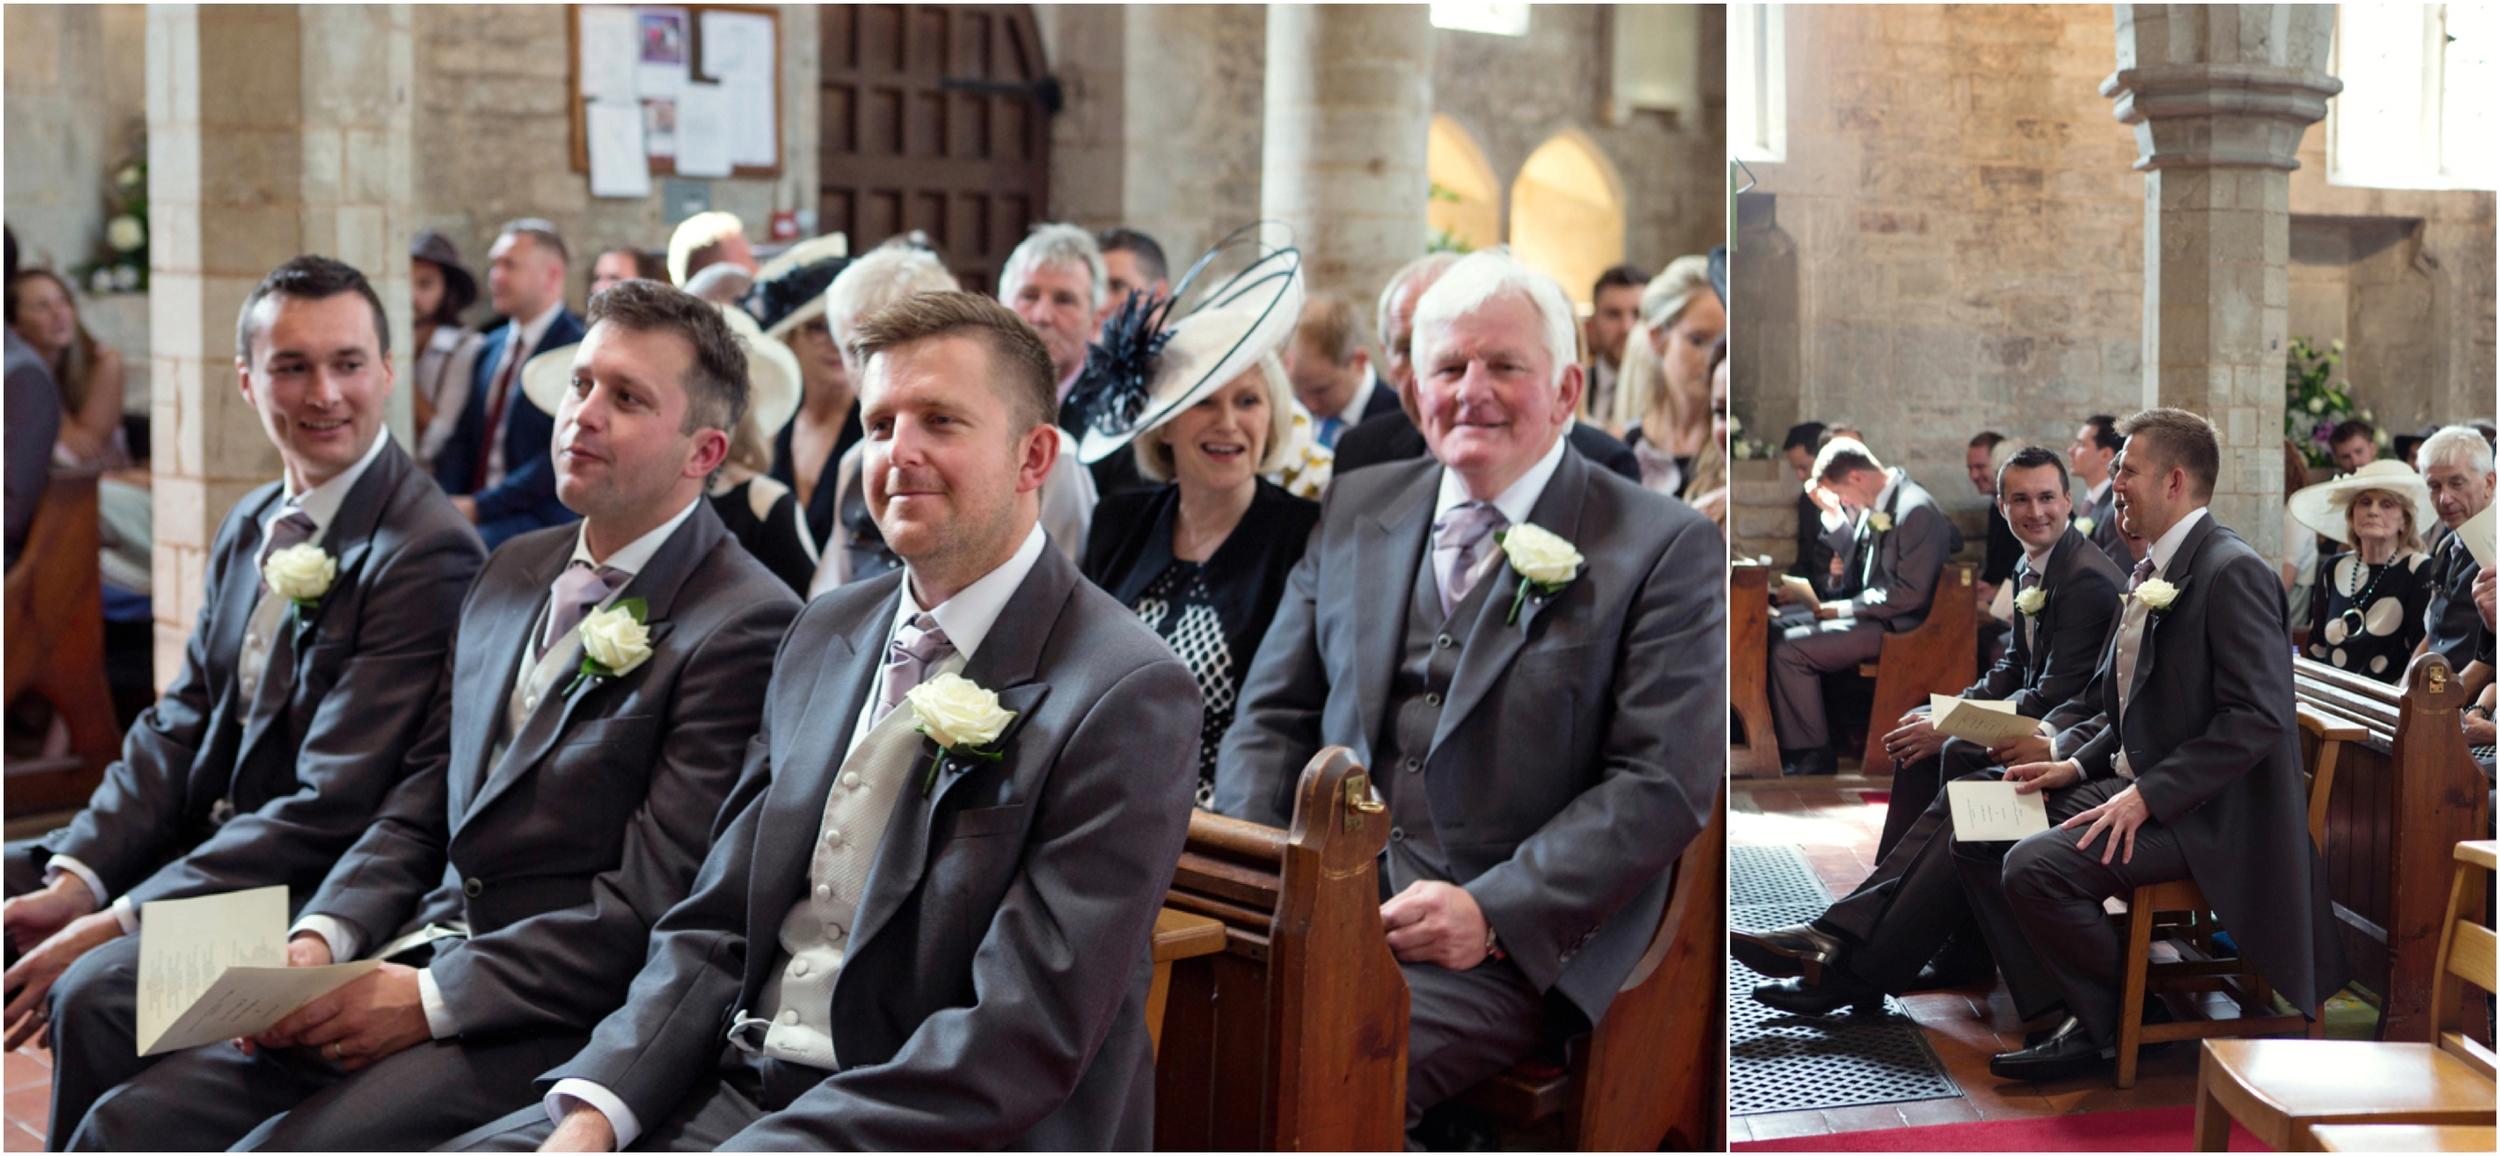 Sophie Evans Photography, Warwickshire Wedding Photography, Welcombe Hotel  (23).jpg